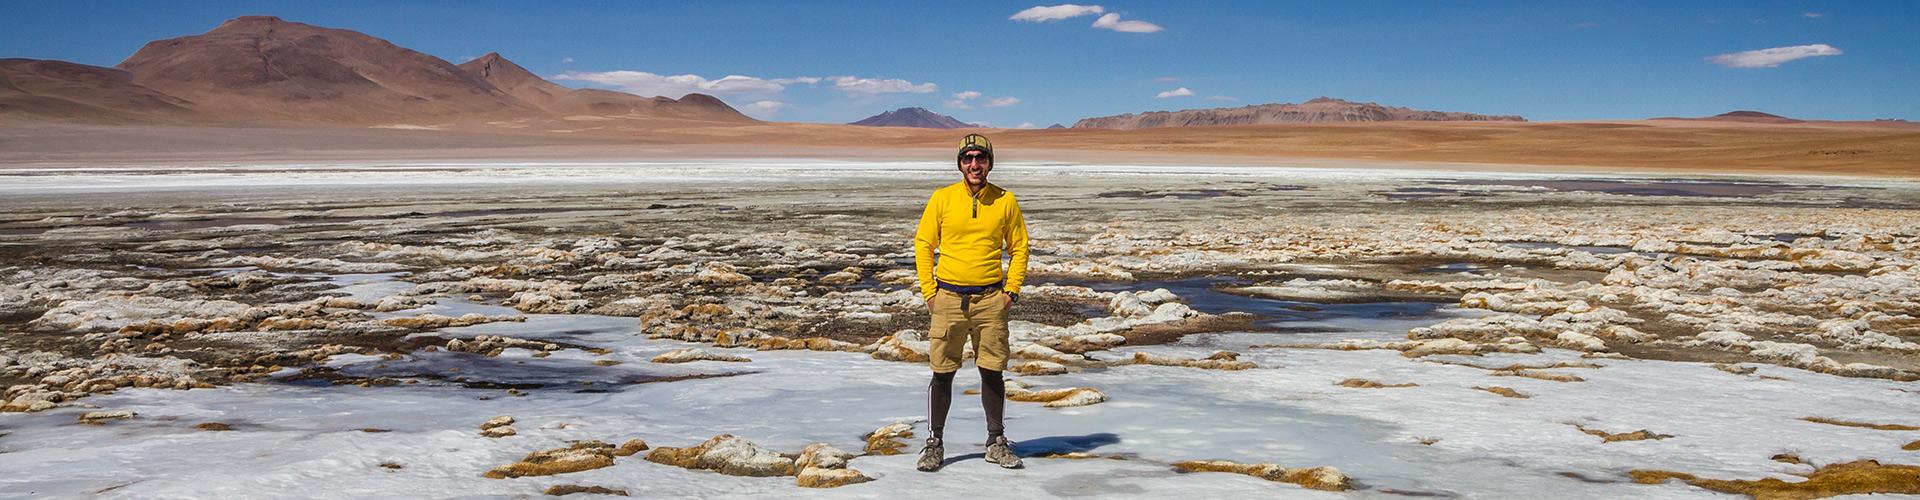 Bolivia Highlights